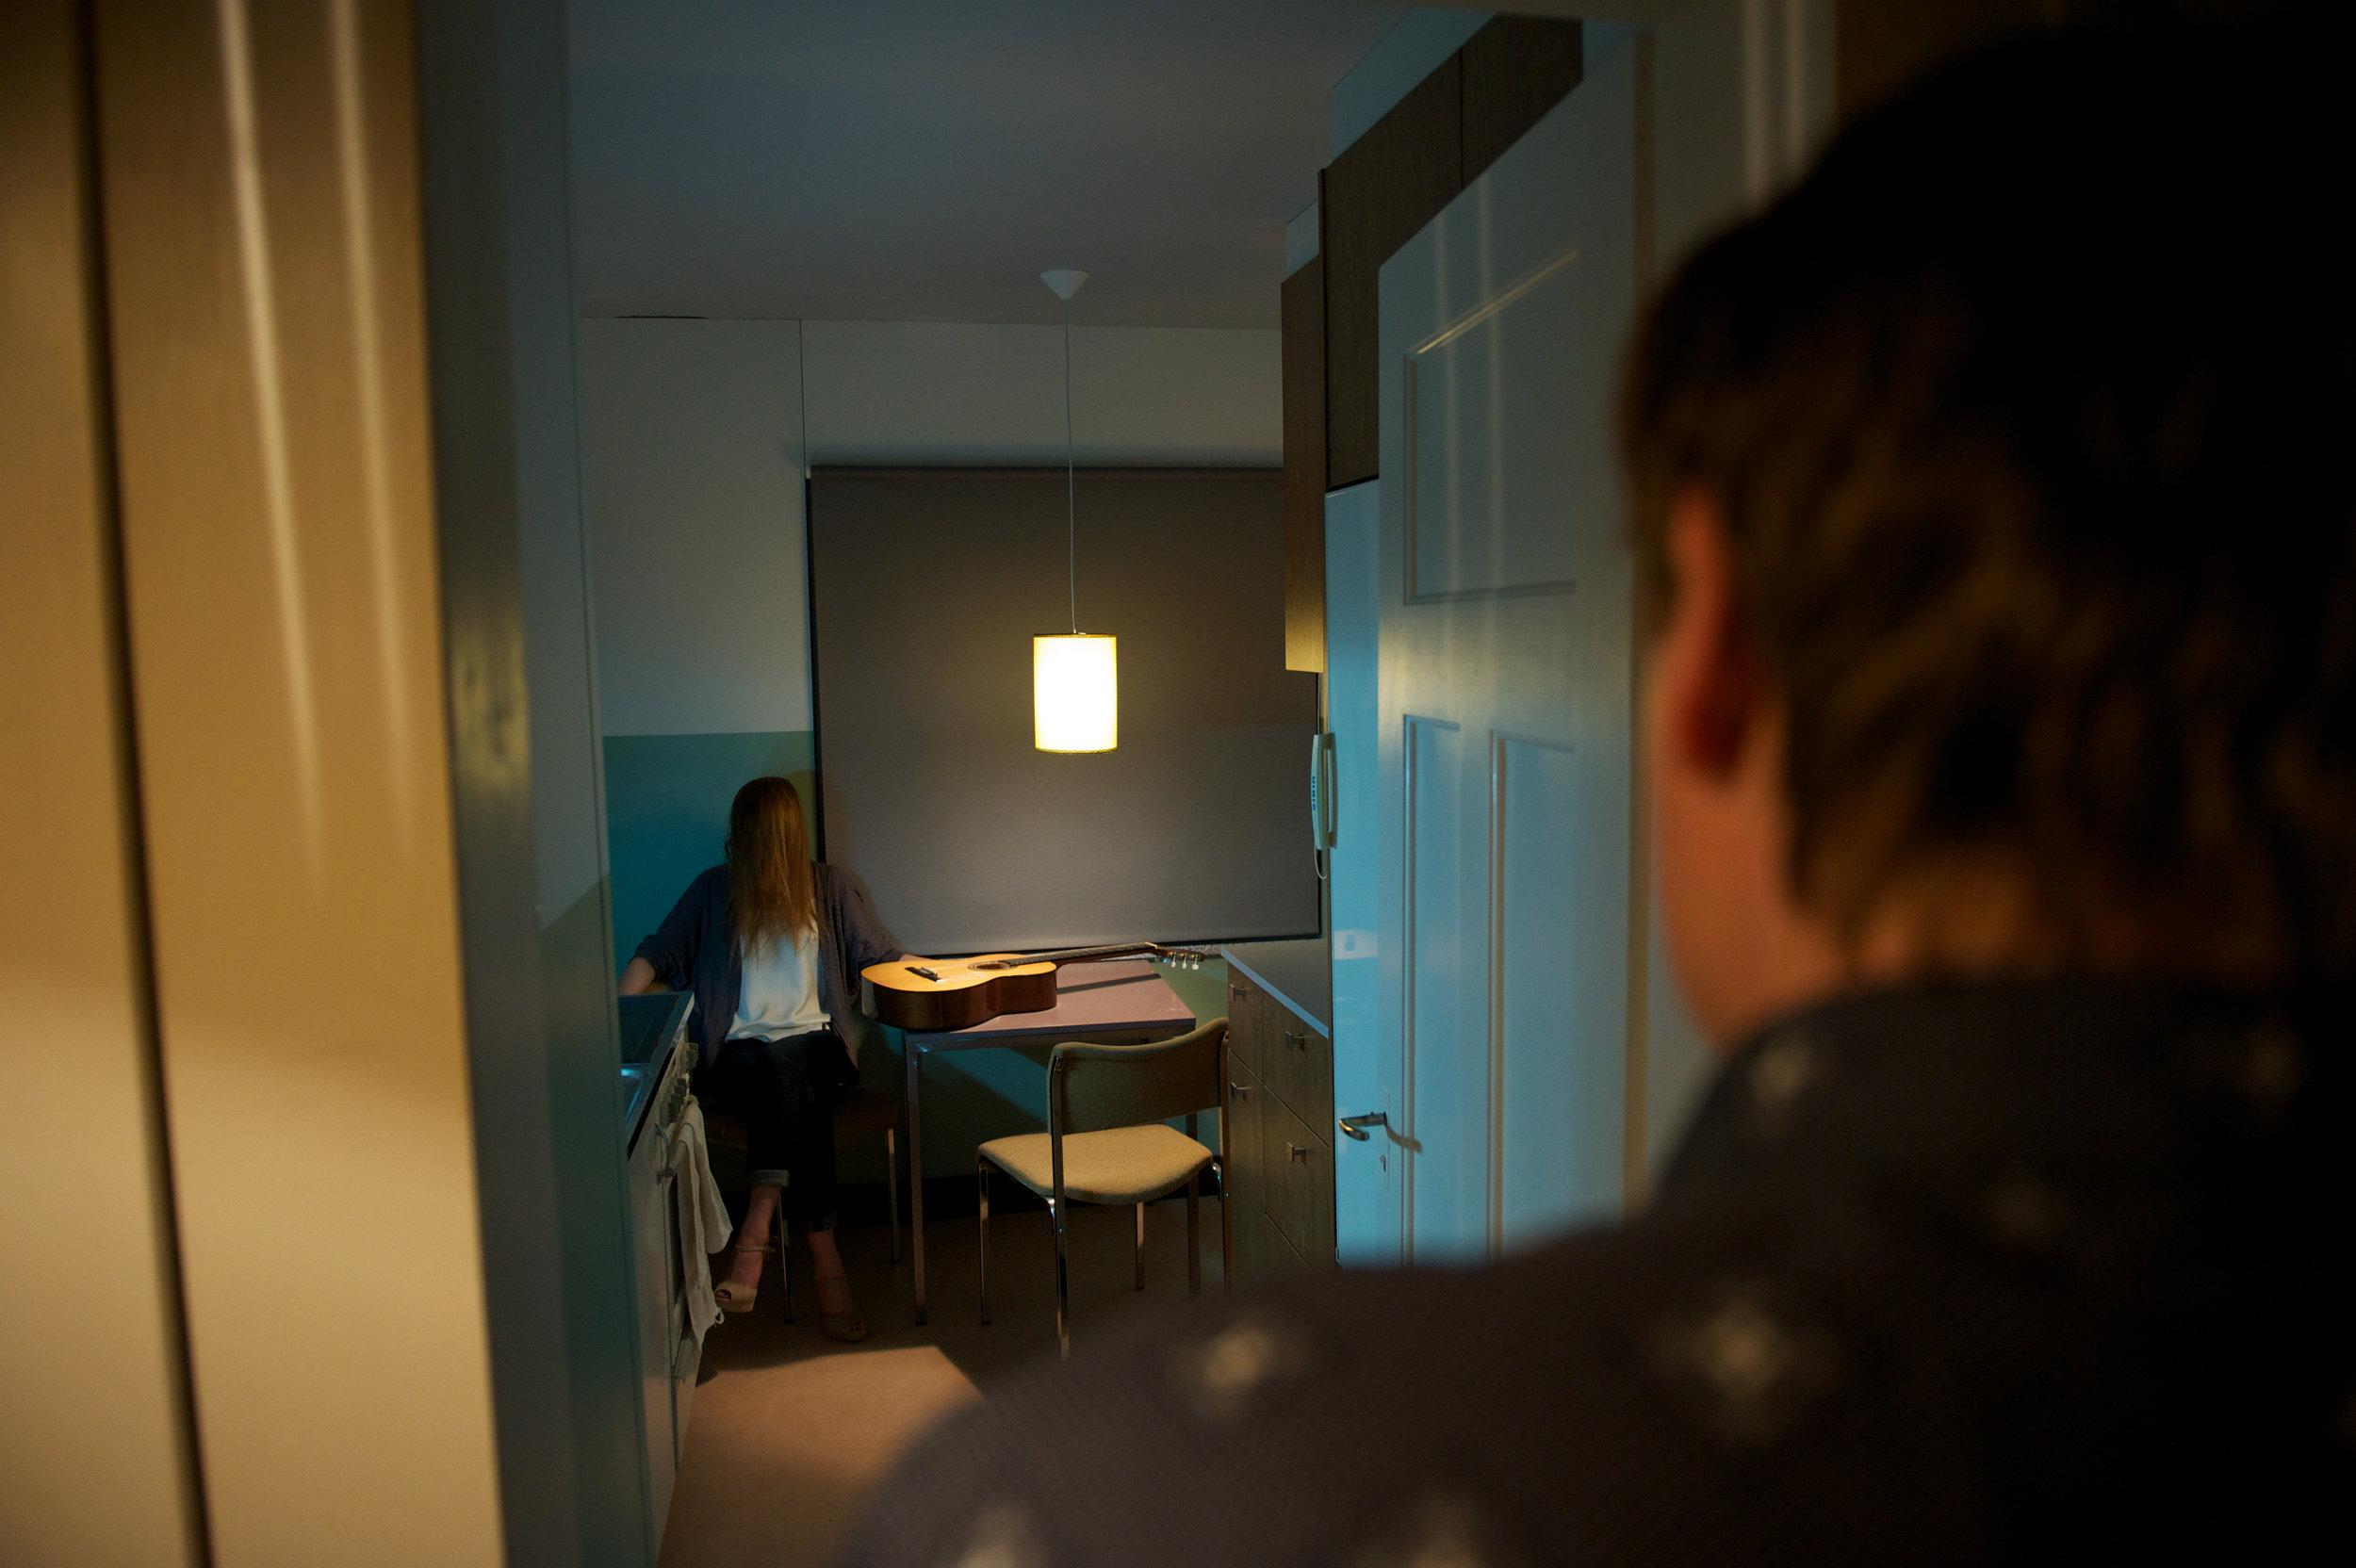 in_my_room__HHO1805_h_holzmann.jpg